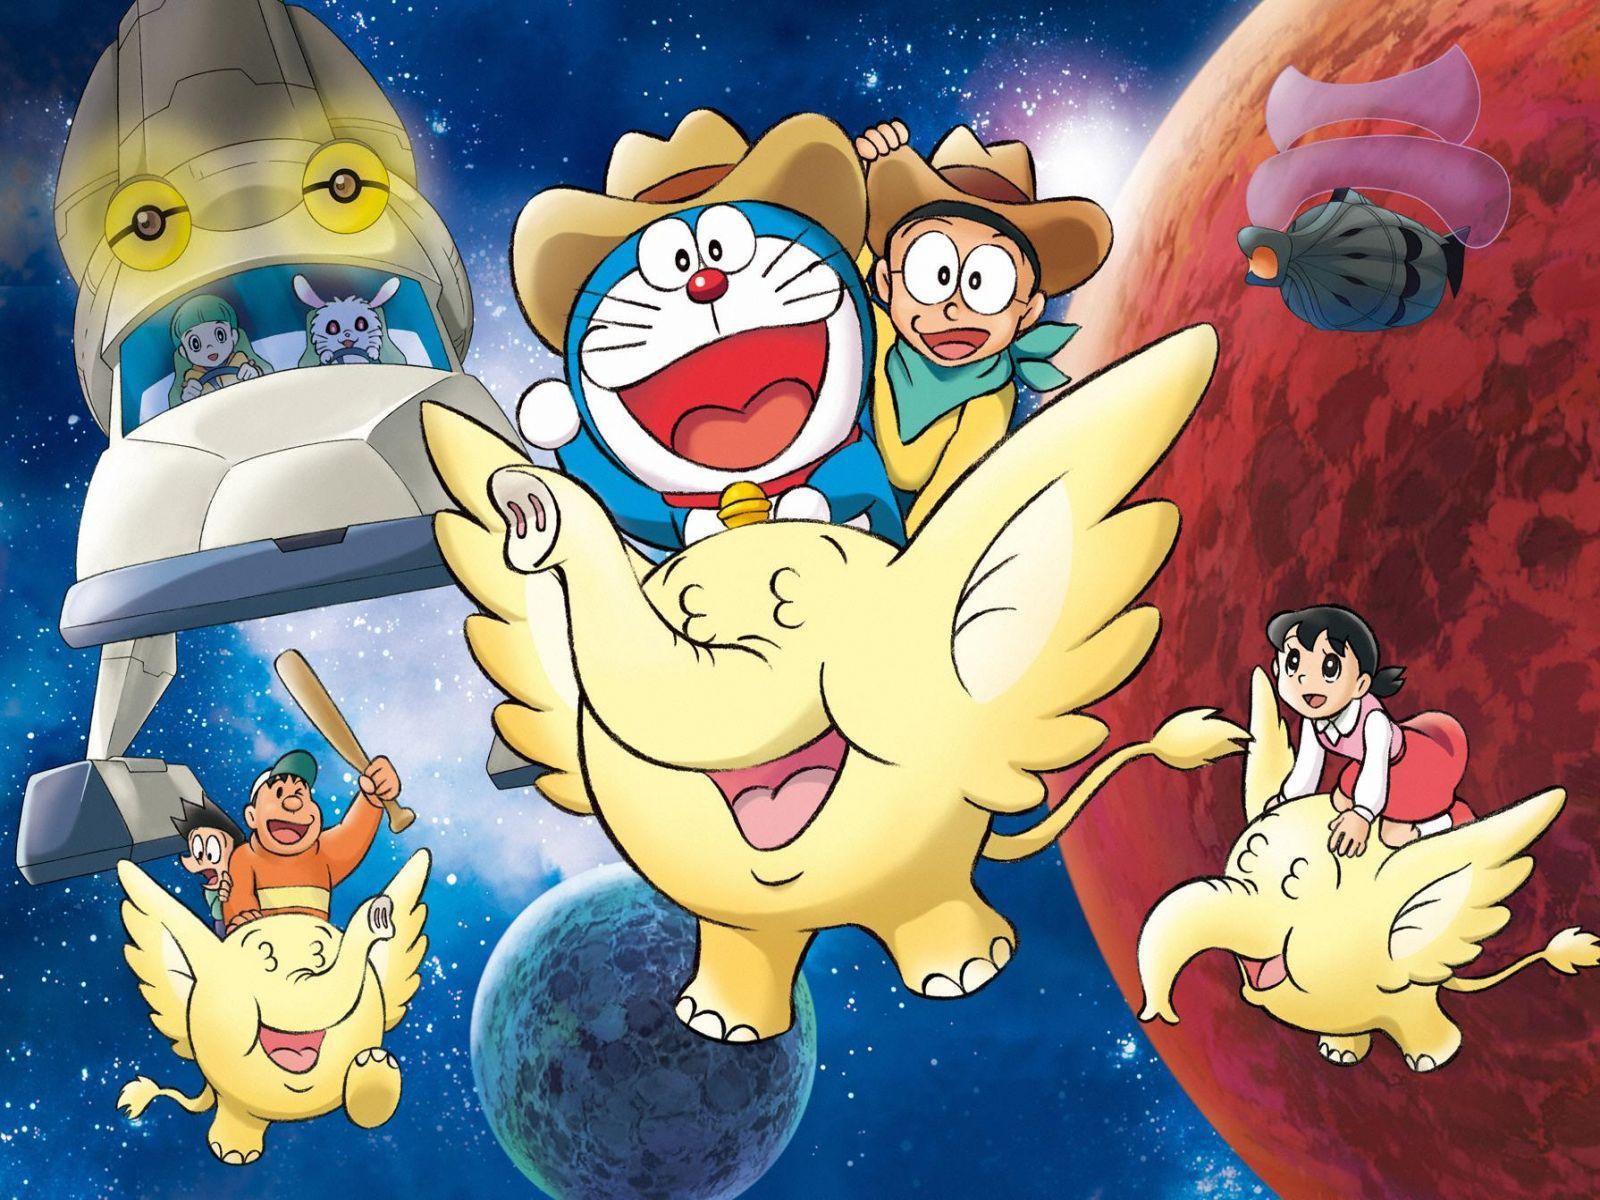 Download wallpaper doraemon free - Doraemon Doraemon Best Free Wallpaper 1422 Wallpaper Wall Height Com